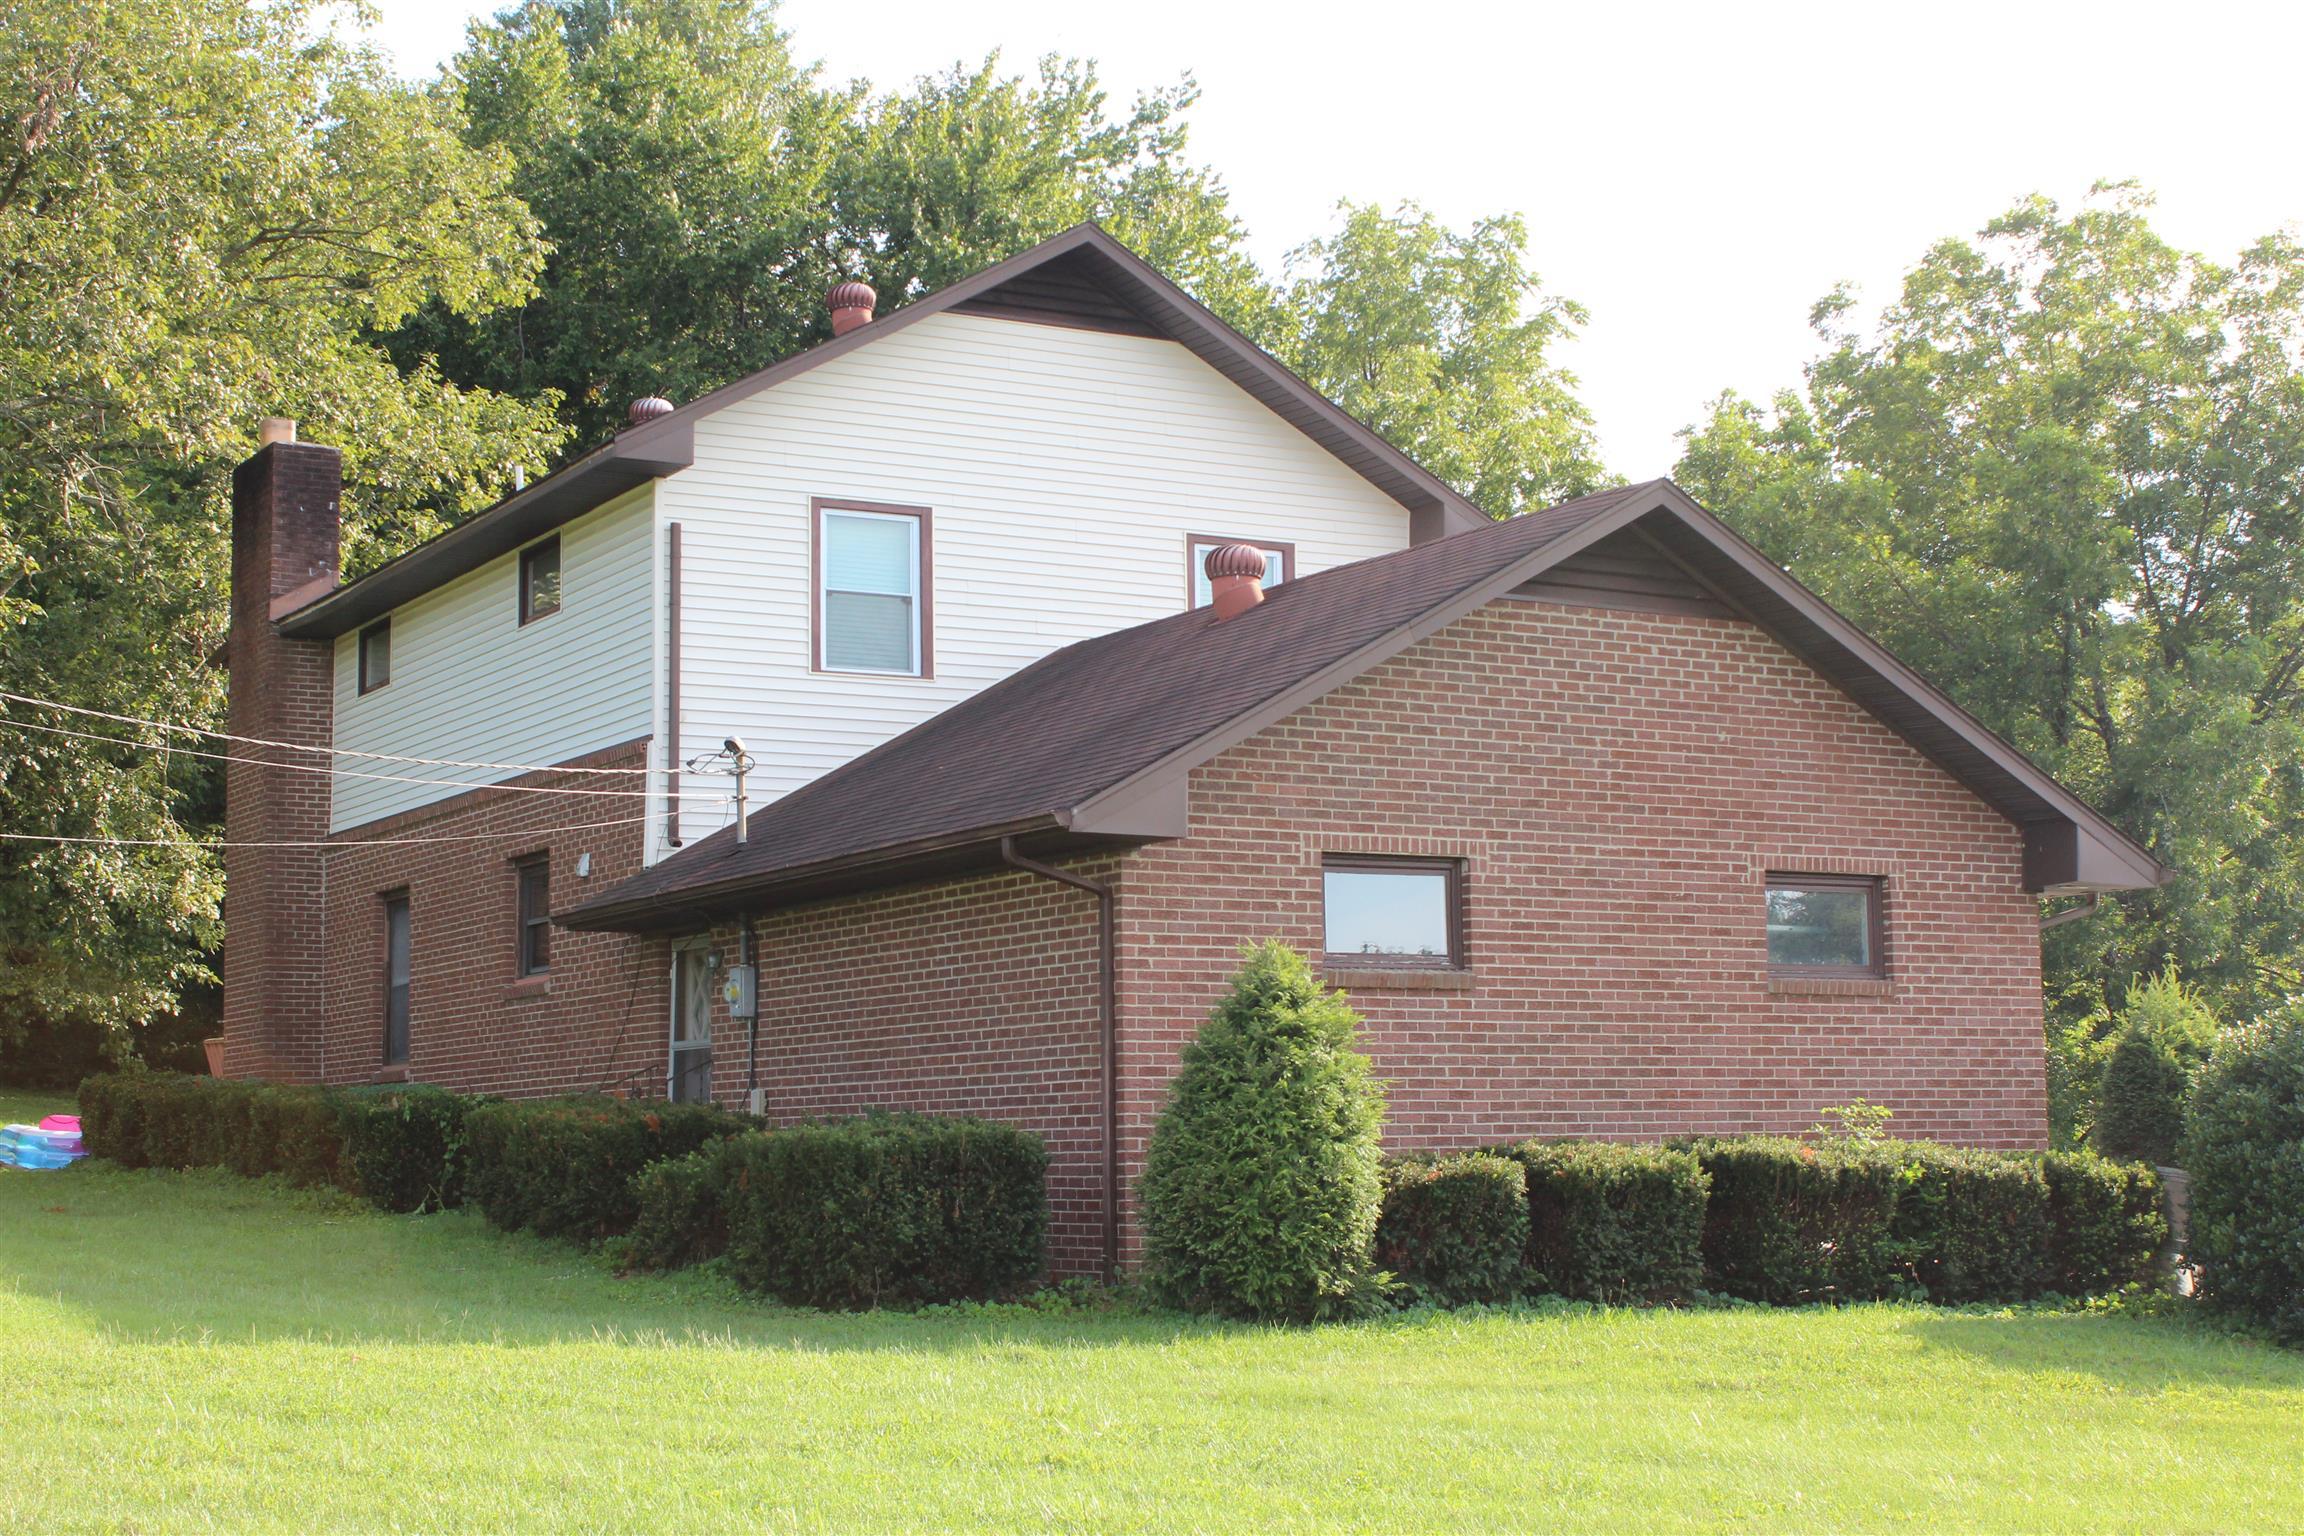 174 Circle Dr, Hartsville, TN 37074 - Hartsville, TN real estate listing